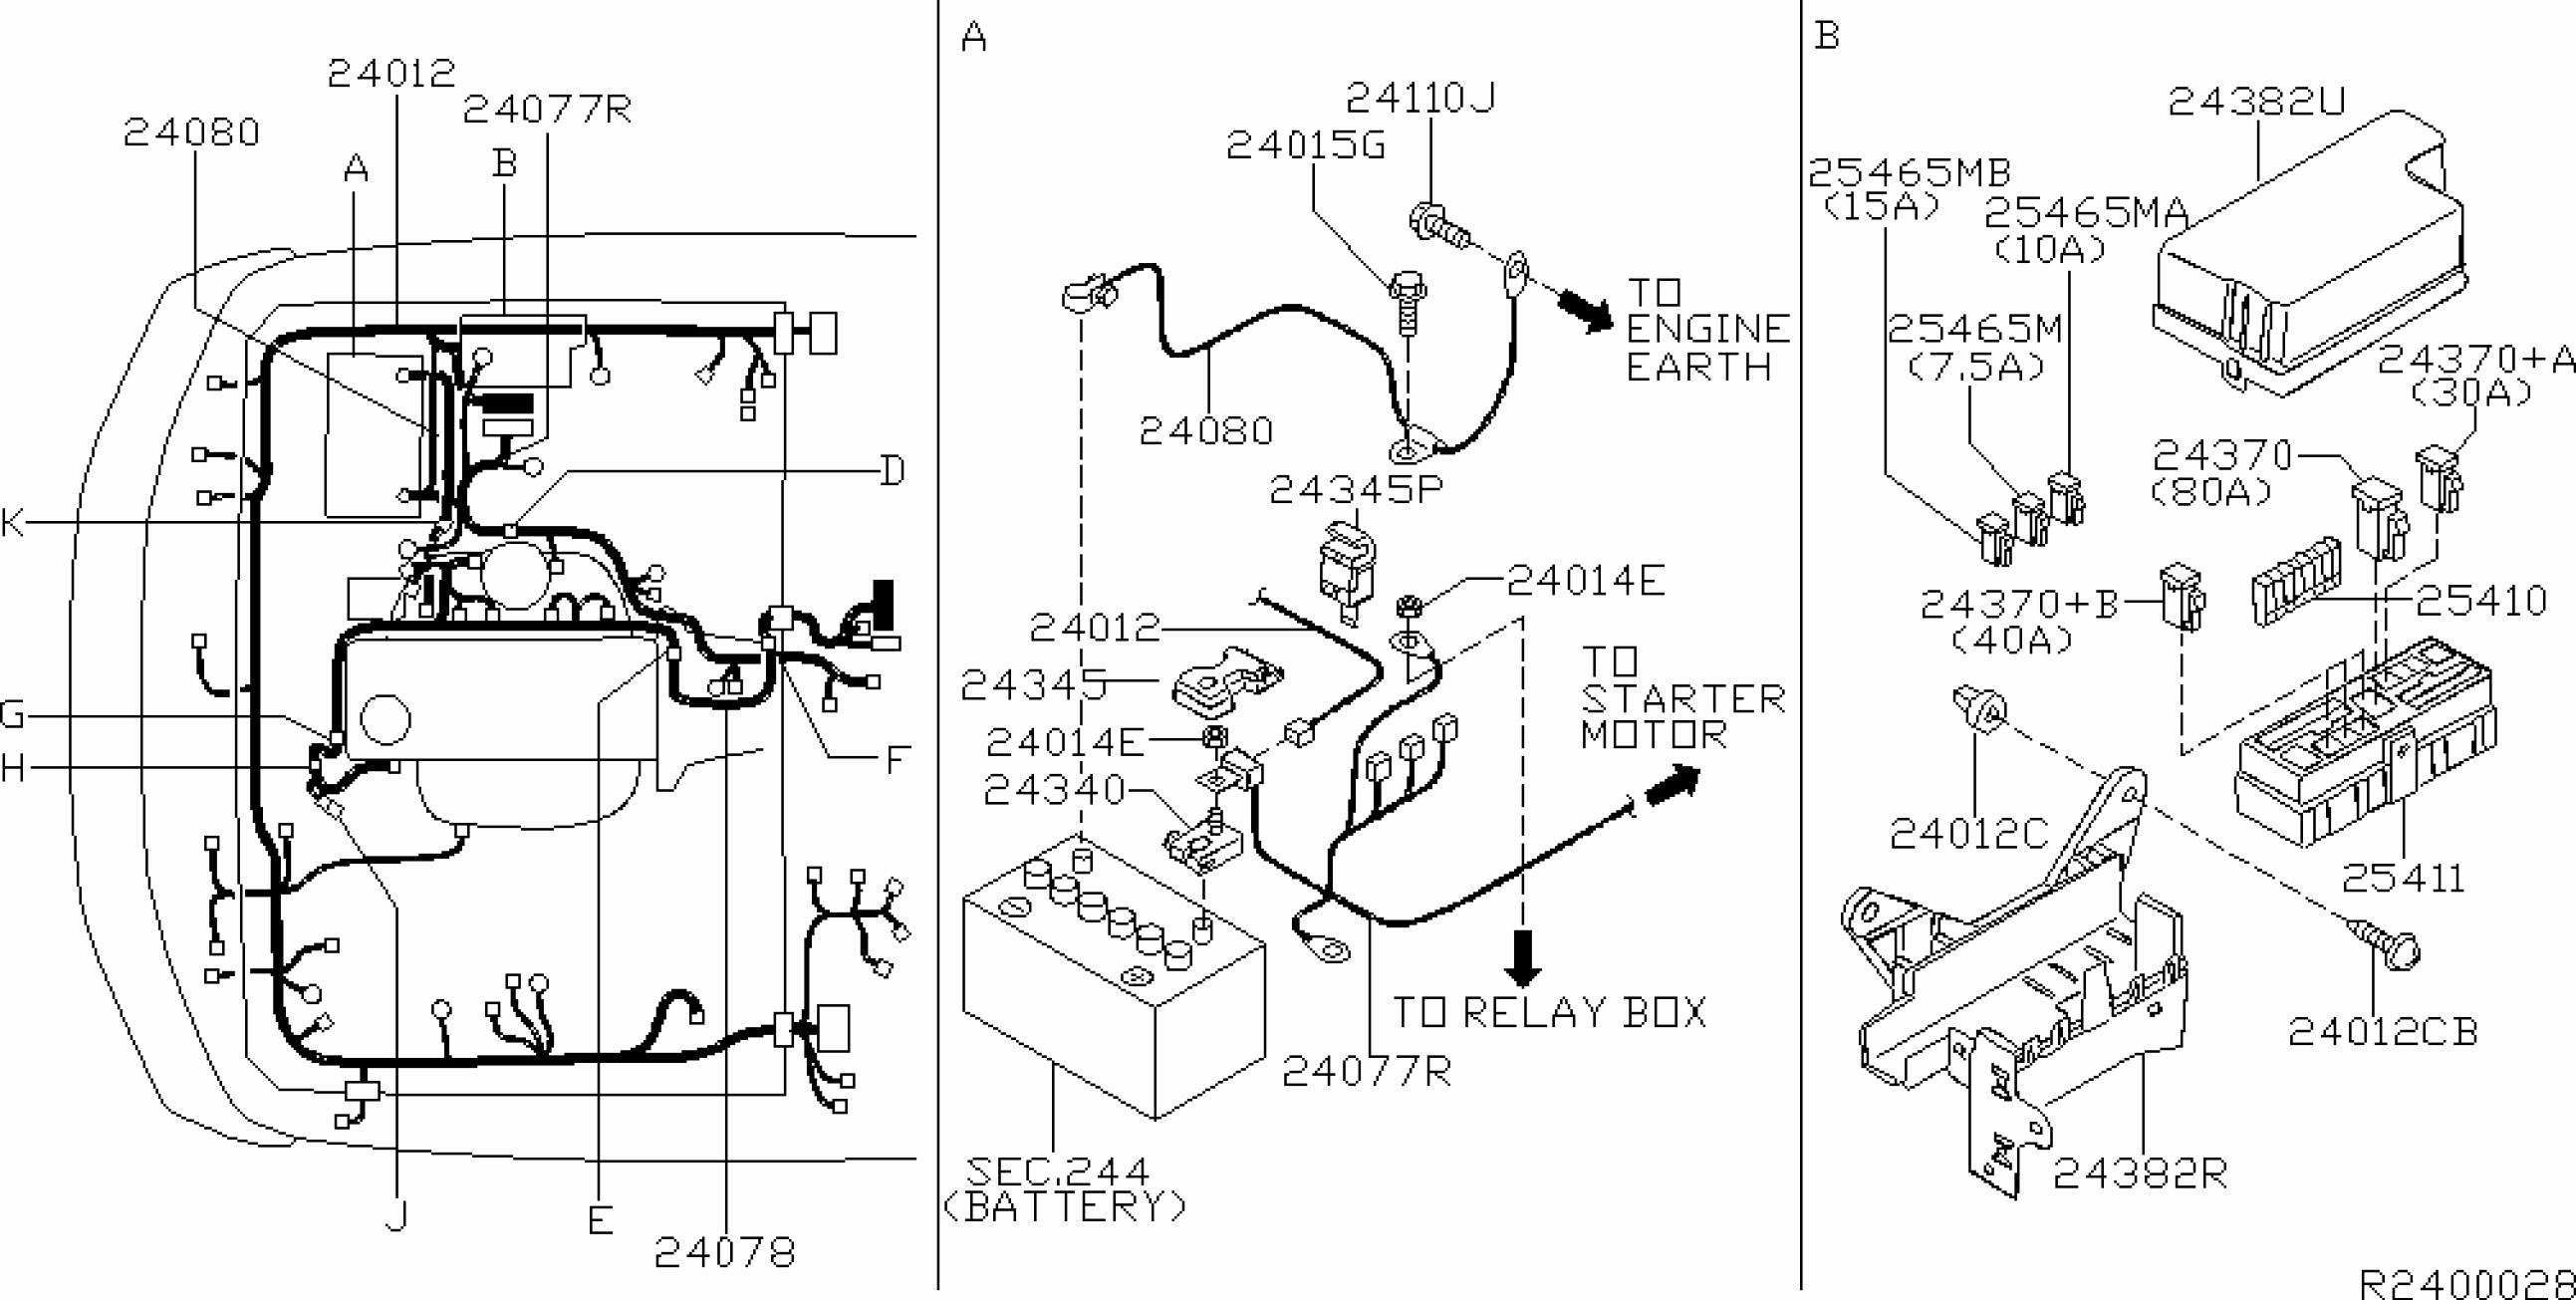 2000 Nissan Pathfinder Engine Diagram 10 Luxury 2000 Nissan Xterra Xe Pics – soogest – Wiring Diagram Of 2000 Nissan Pathfinder Engine Diagram